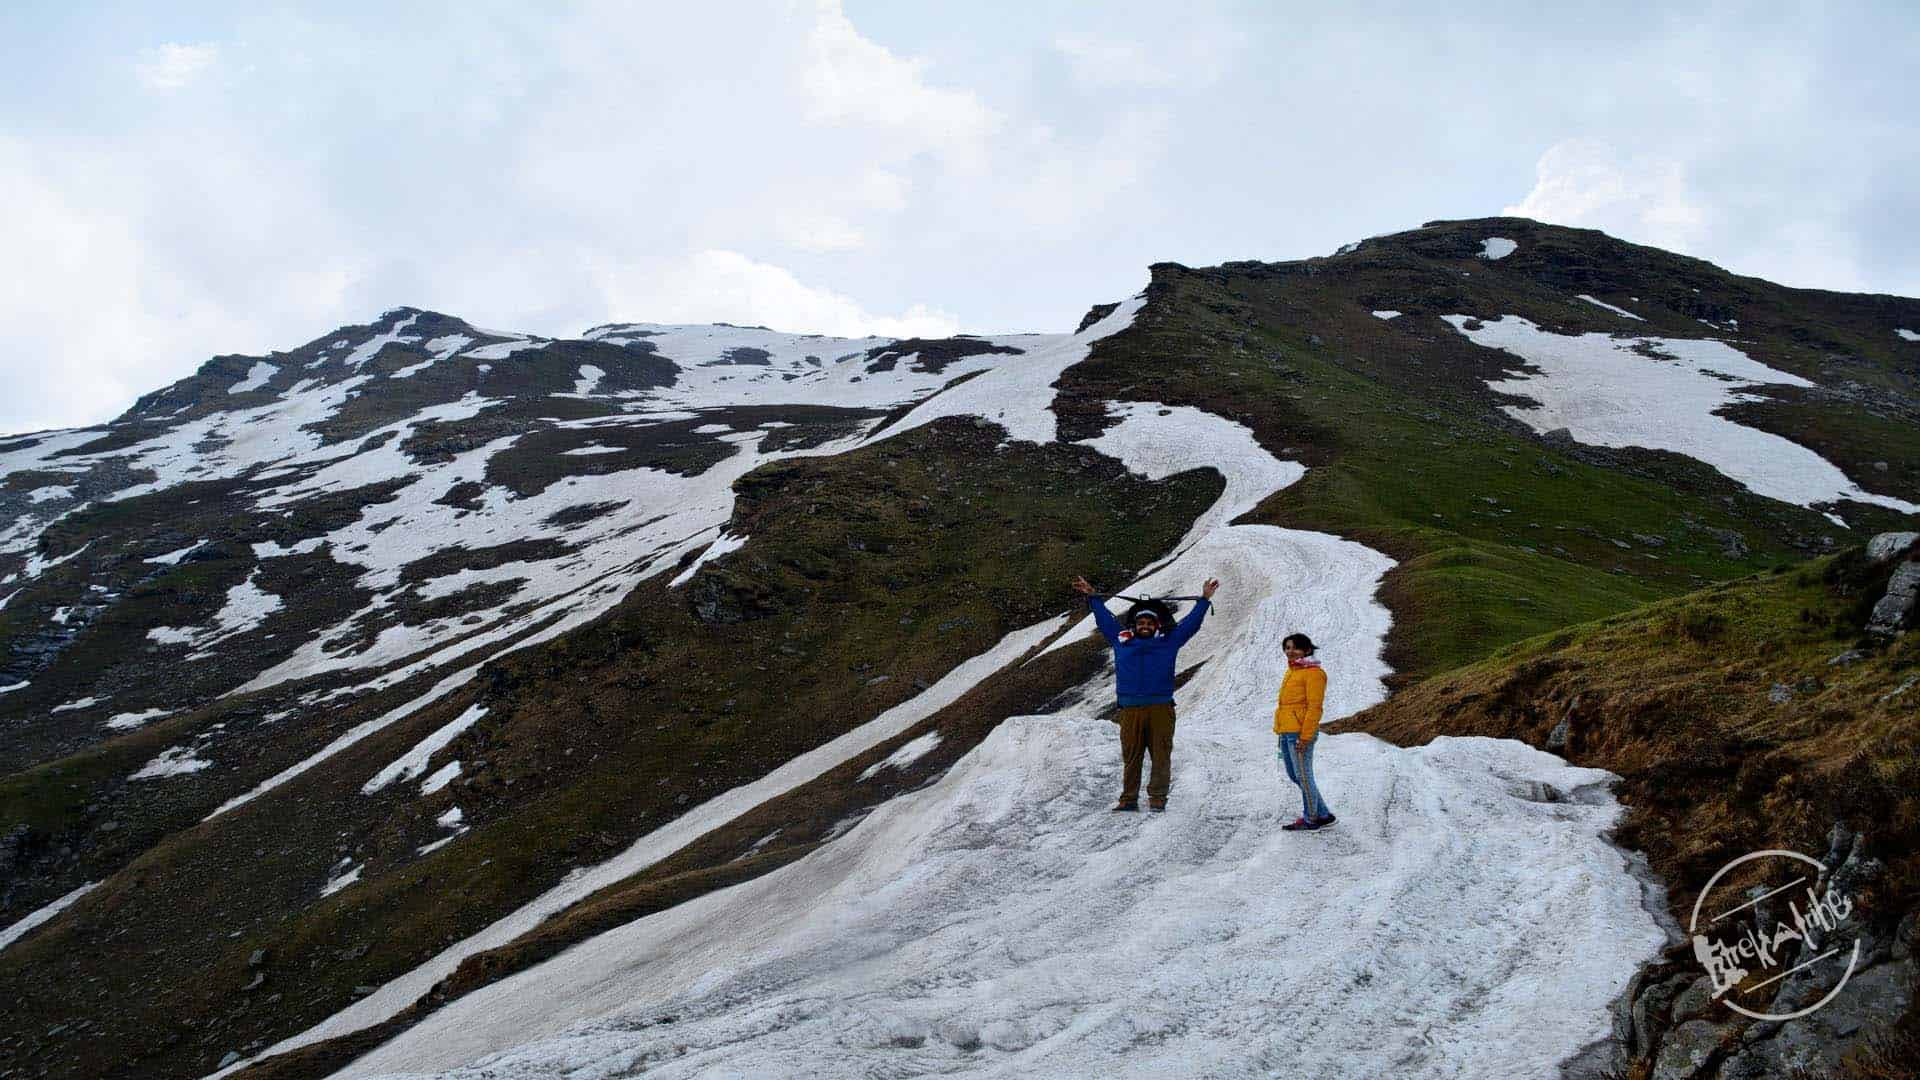 Bhrigu Lake Trekking - An astounding experience